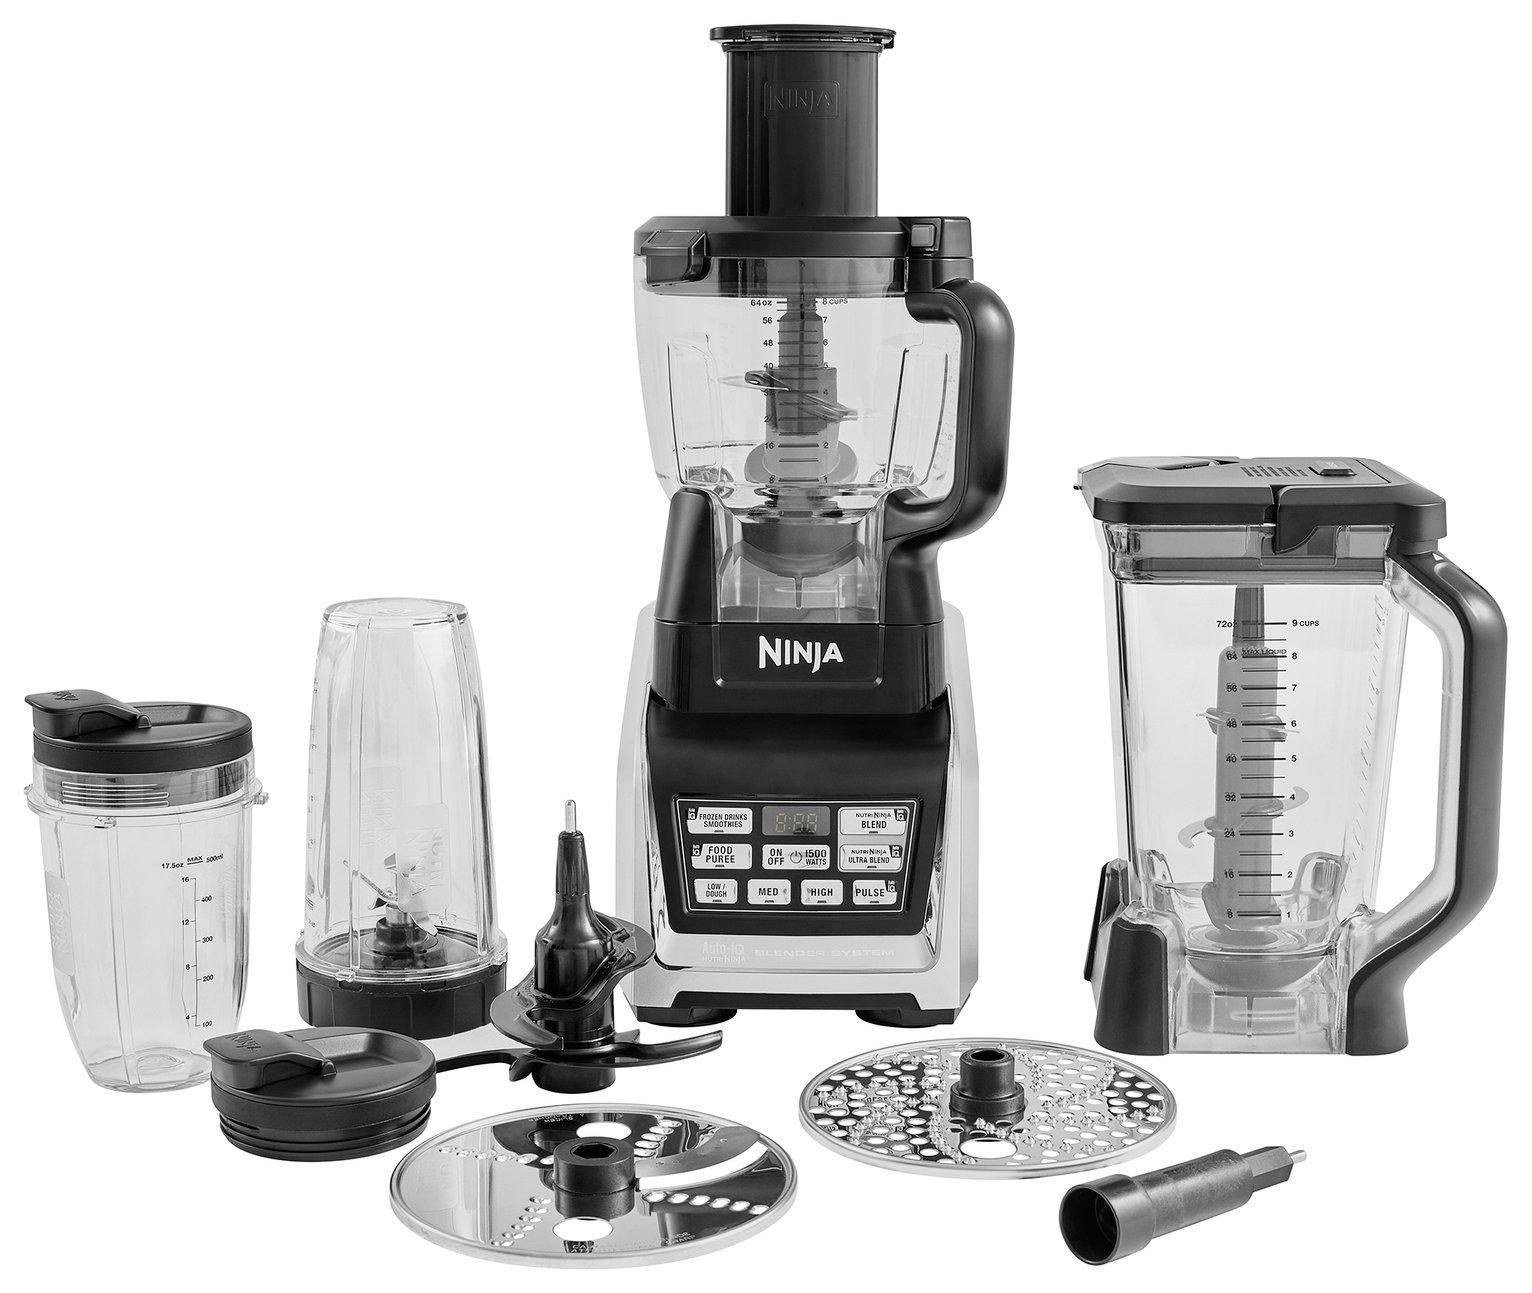 Ninja - Kitchen System with Nutri Ninja - ? BL682UK2